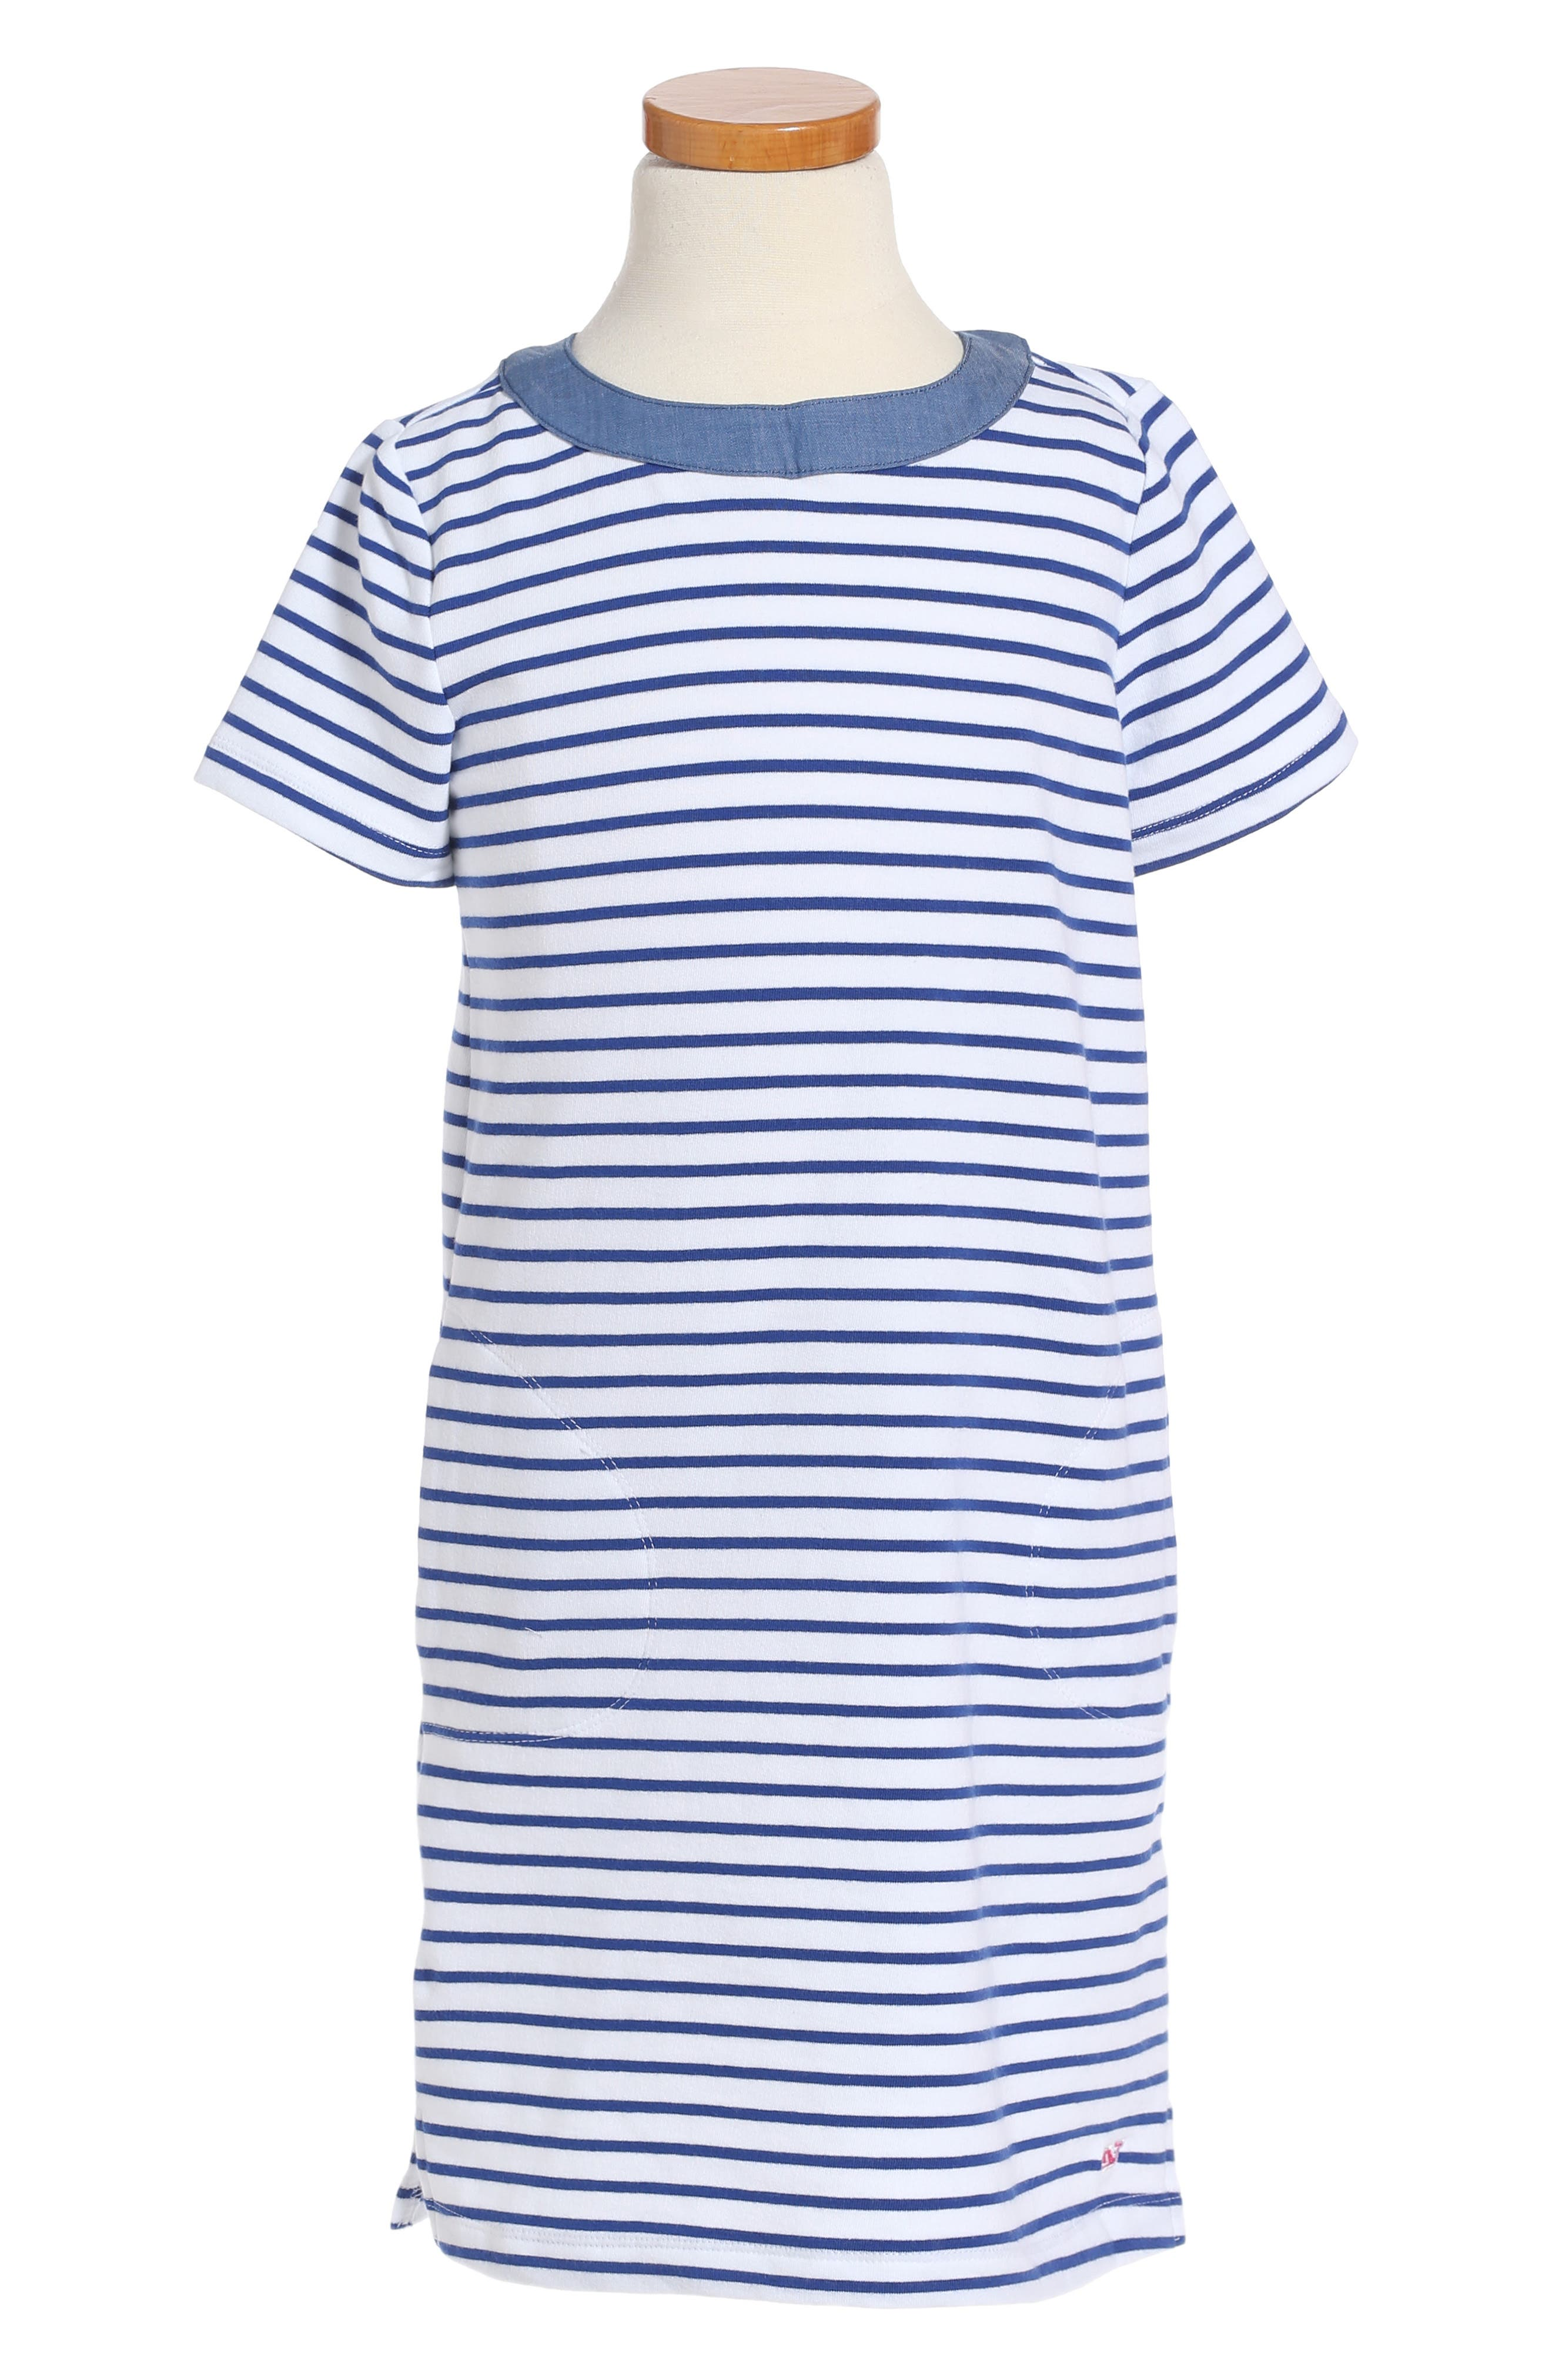 Alternate Image 1 Selected - vineyard vines Stripe Stretch Cotton Shift Dress (Little Girls & Big Girls)